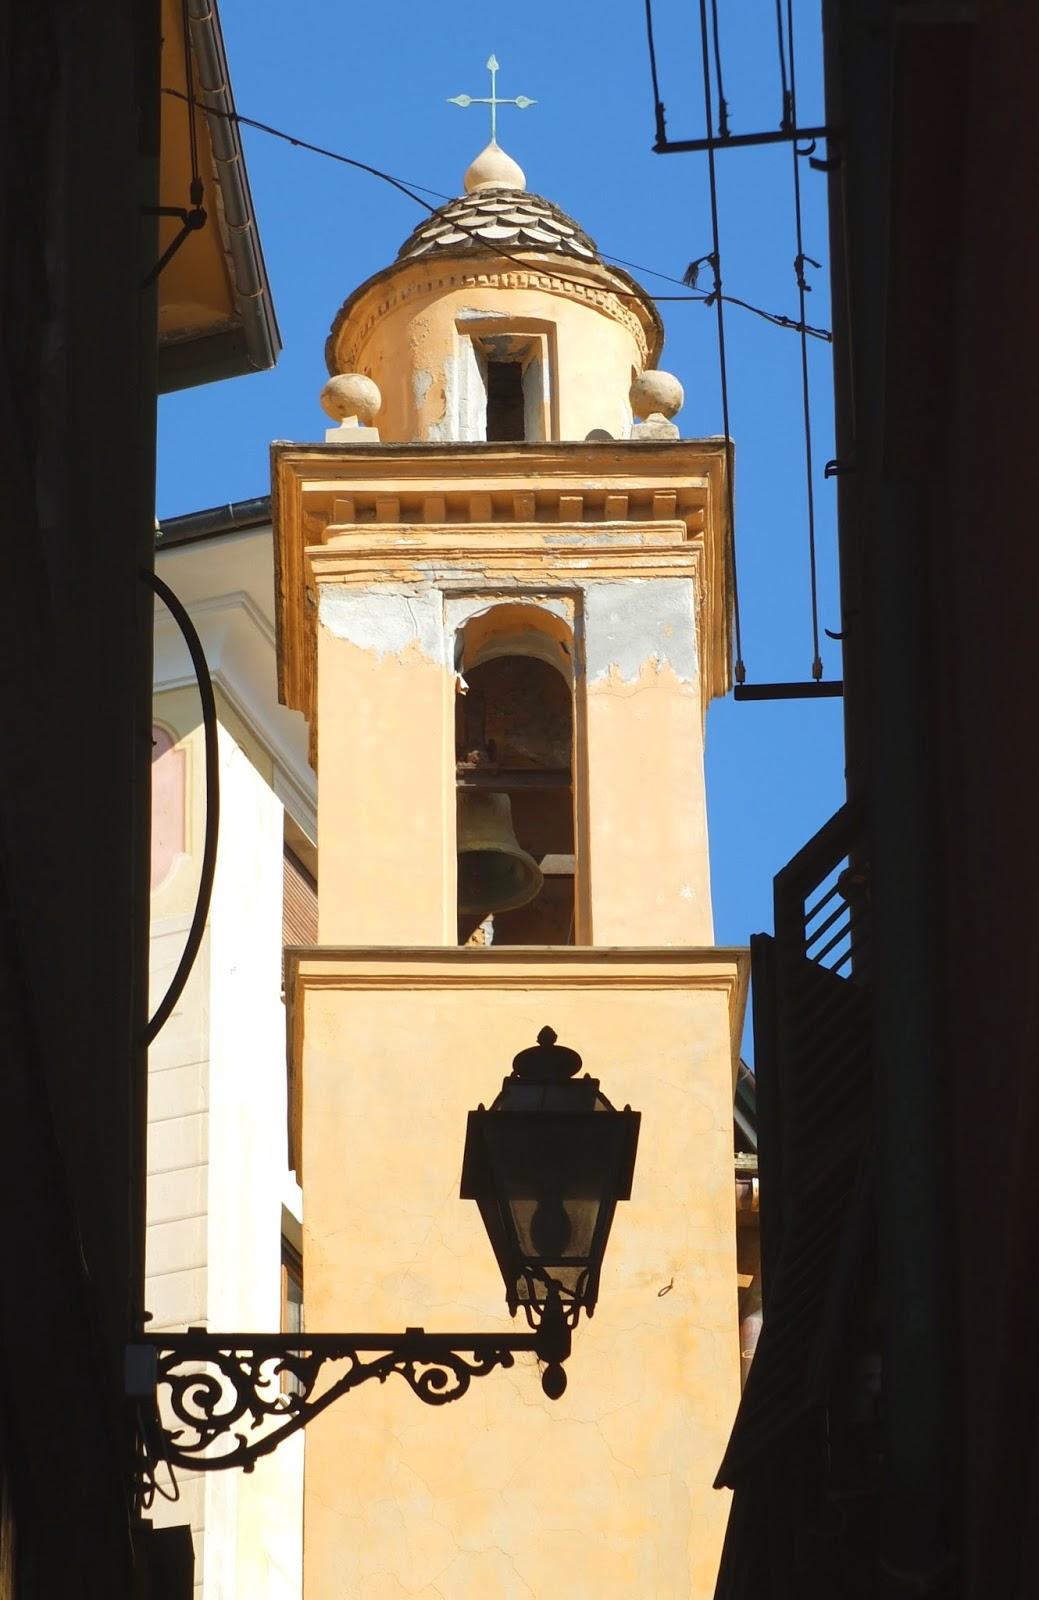 Camogli, Liguria, Italy. Oratorio of San Prospero.